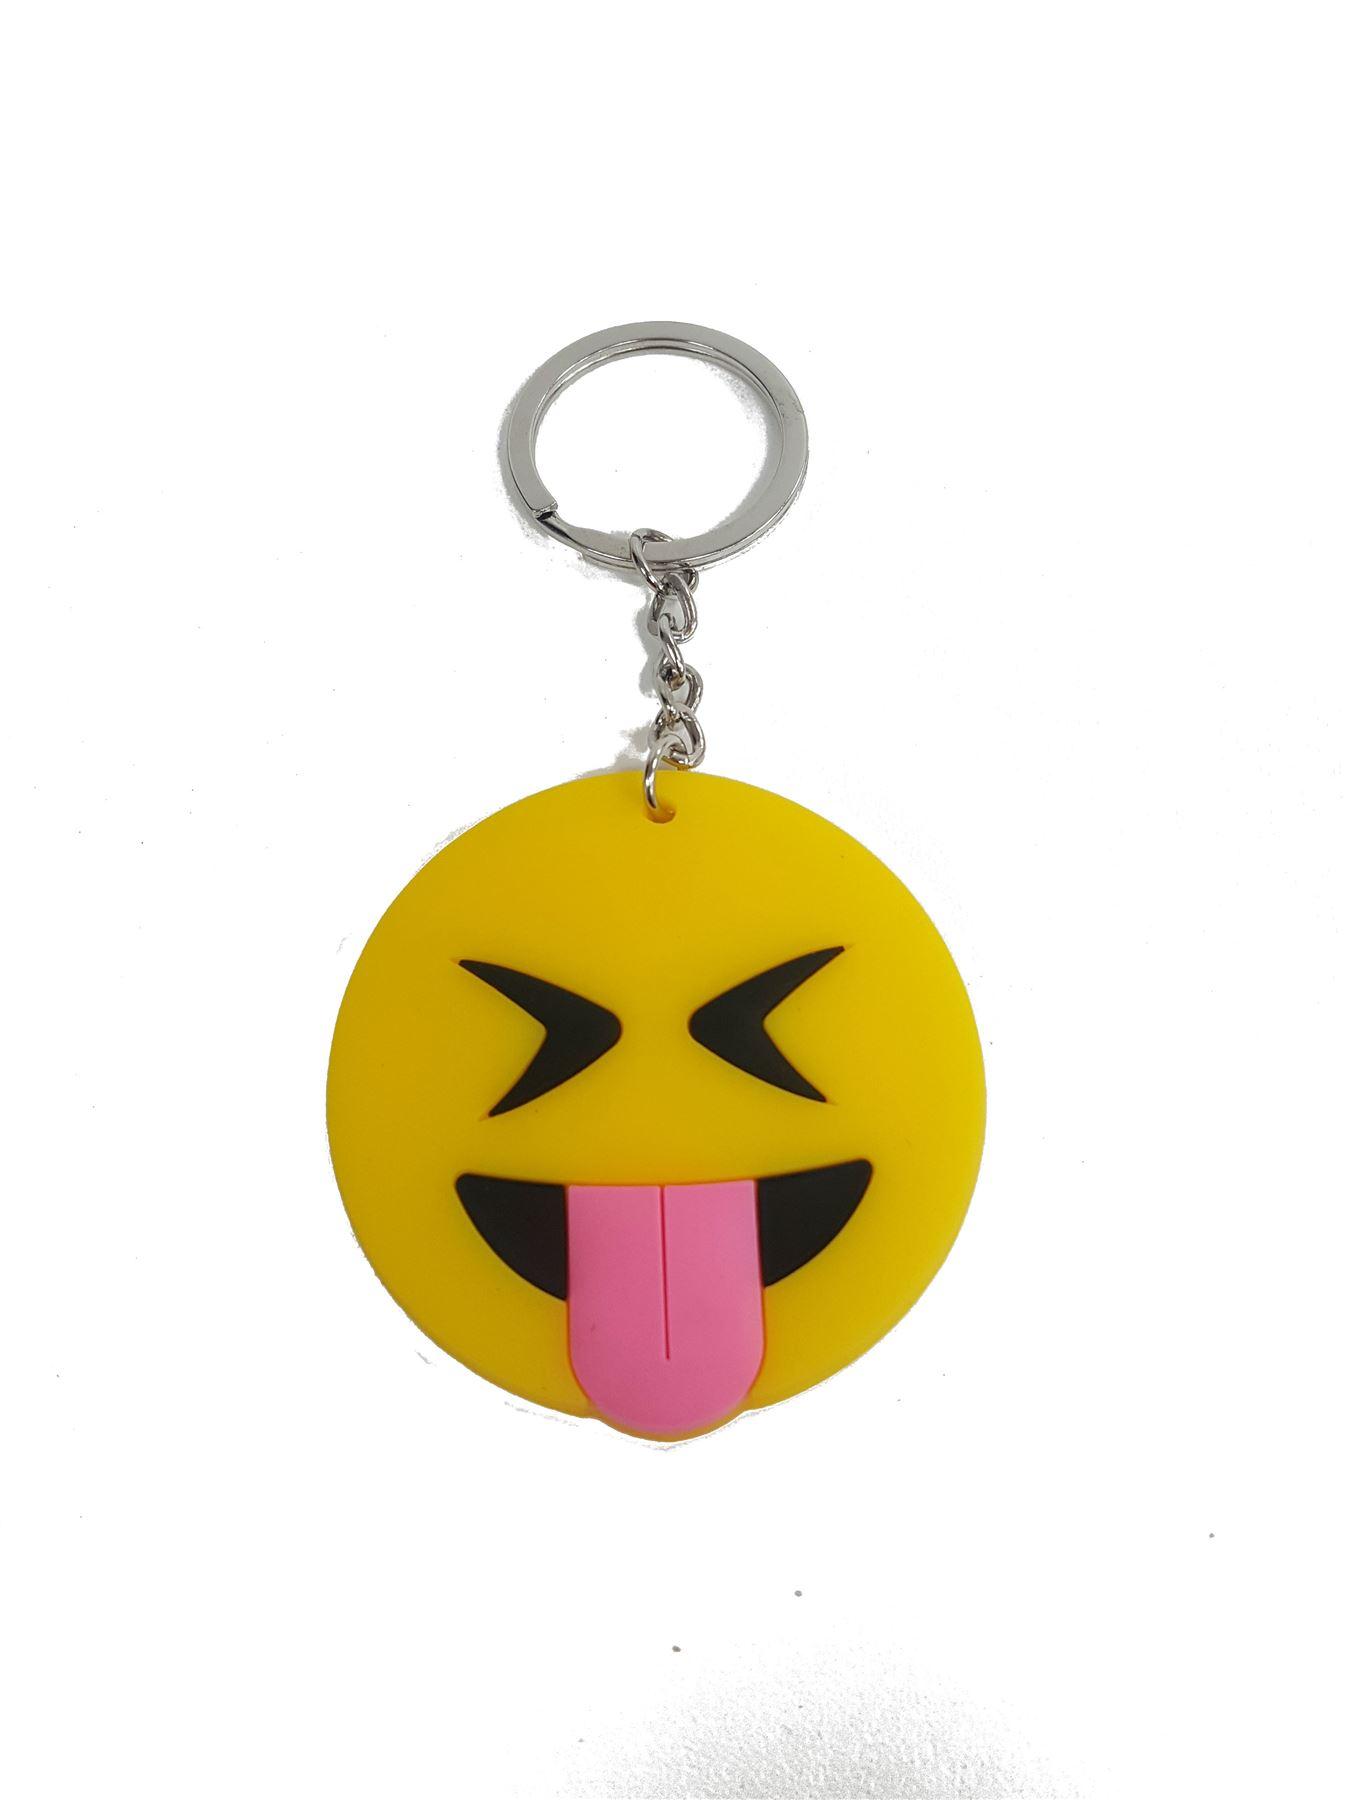 Emoji Emotion Rubber Keyring Funny Smiley Faces Gift Chain Novelty